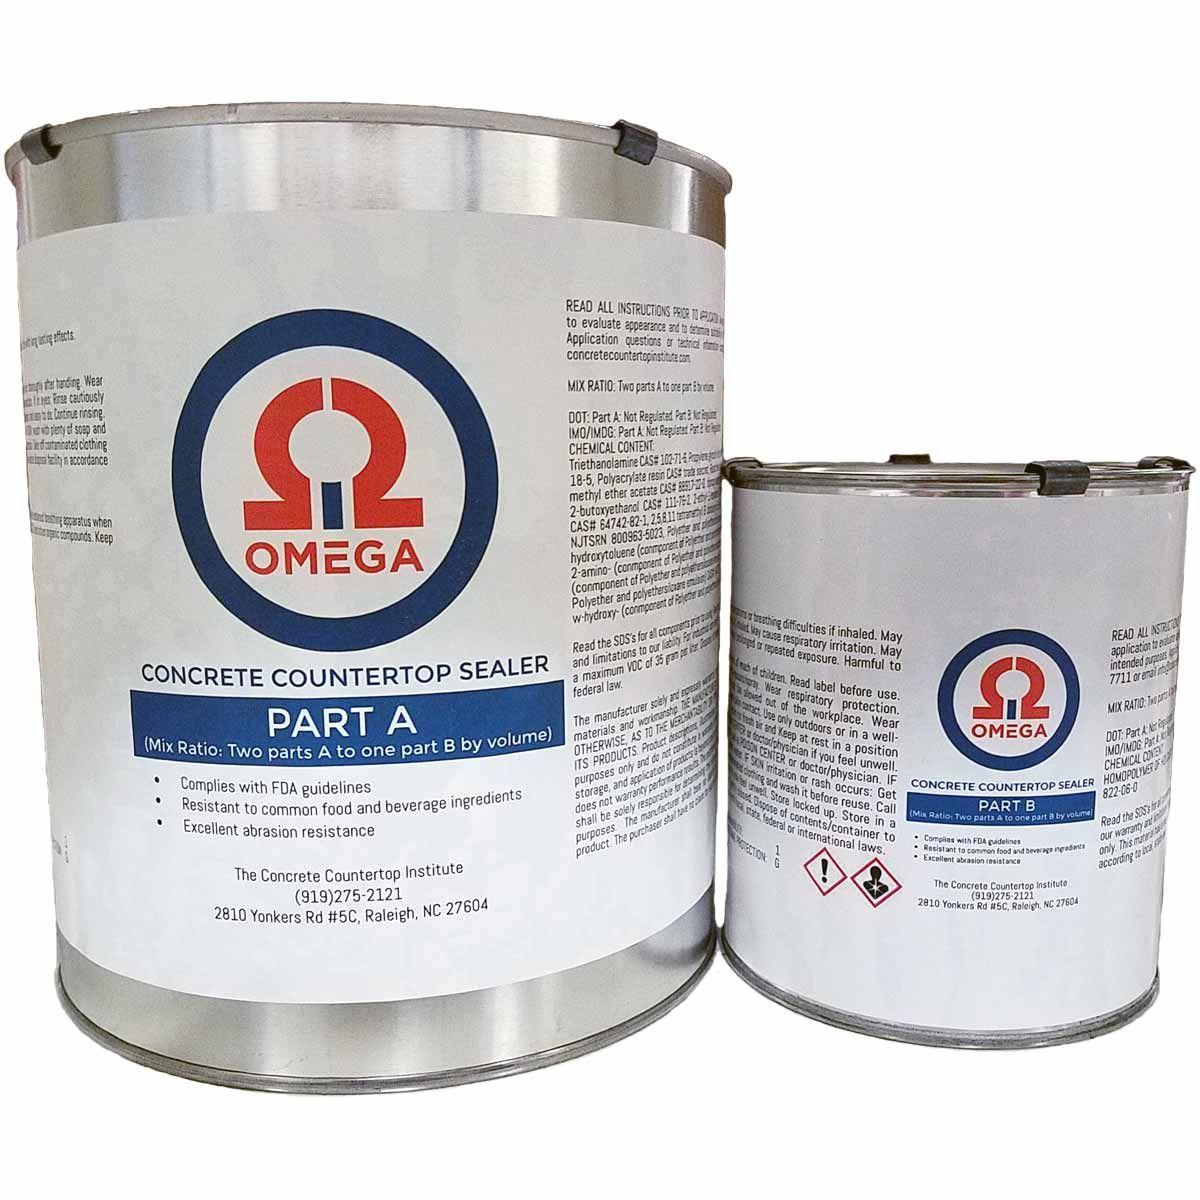 Omega Concrete Countertop Sealertm The Last Sealer You Ll Ever